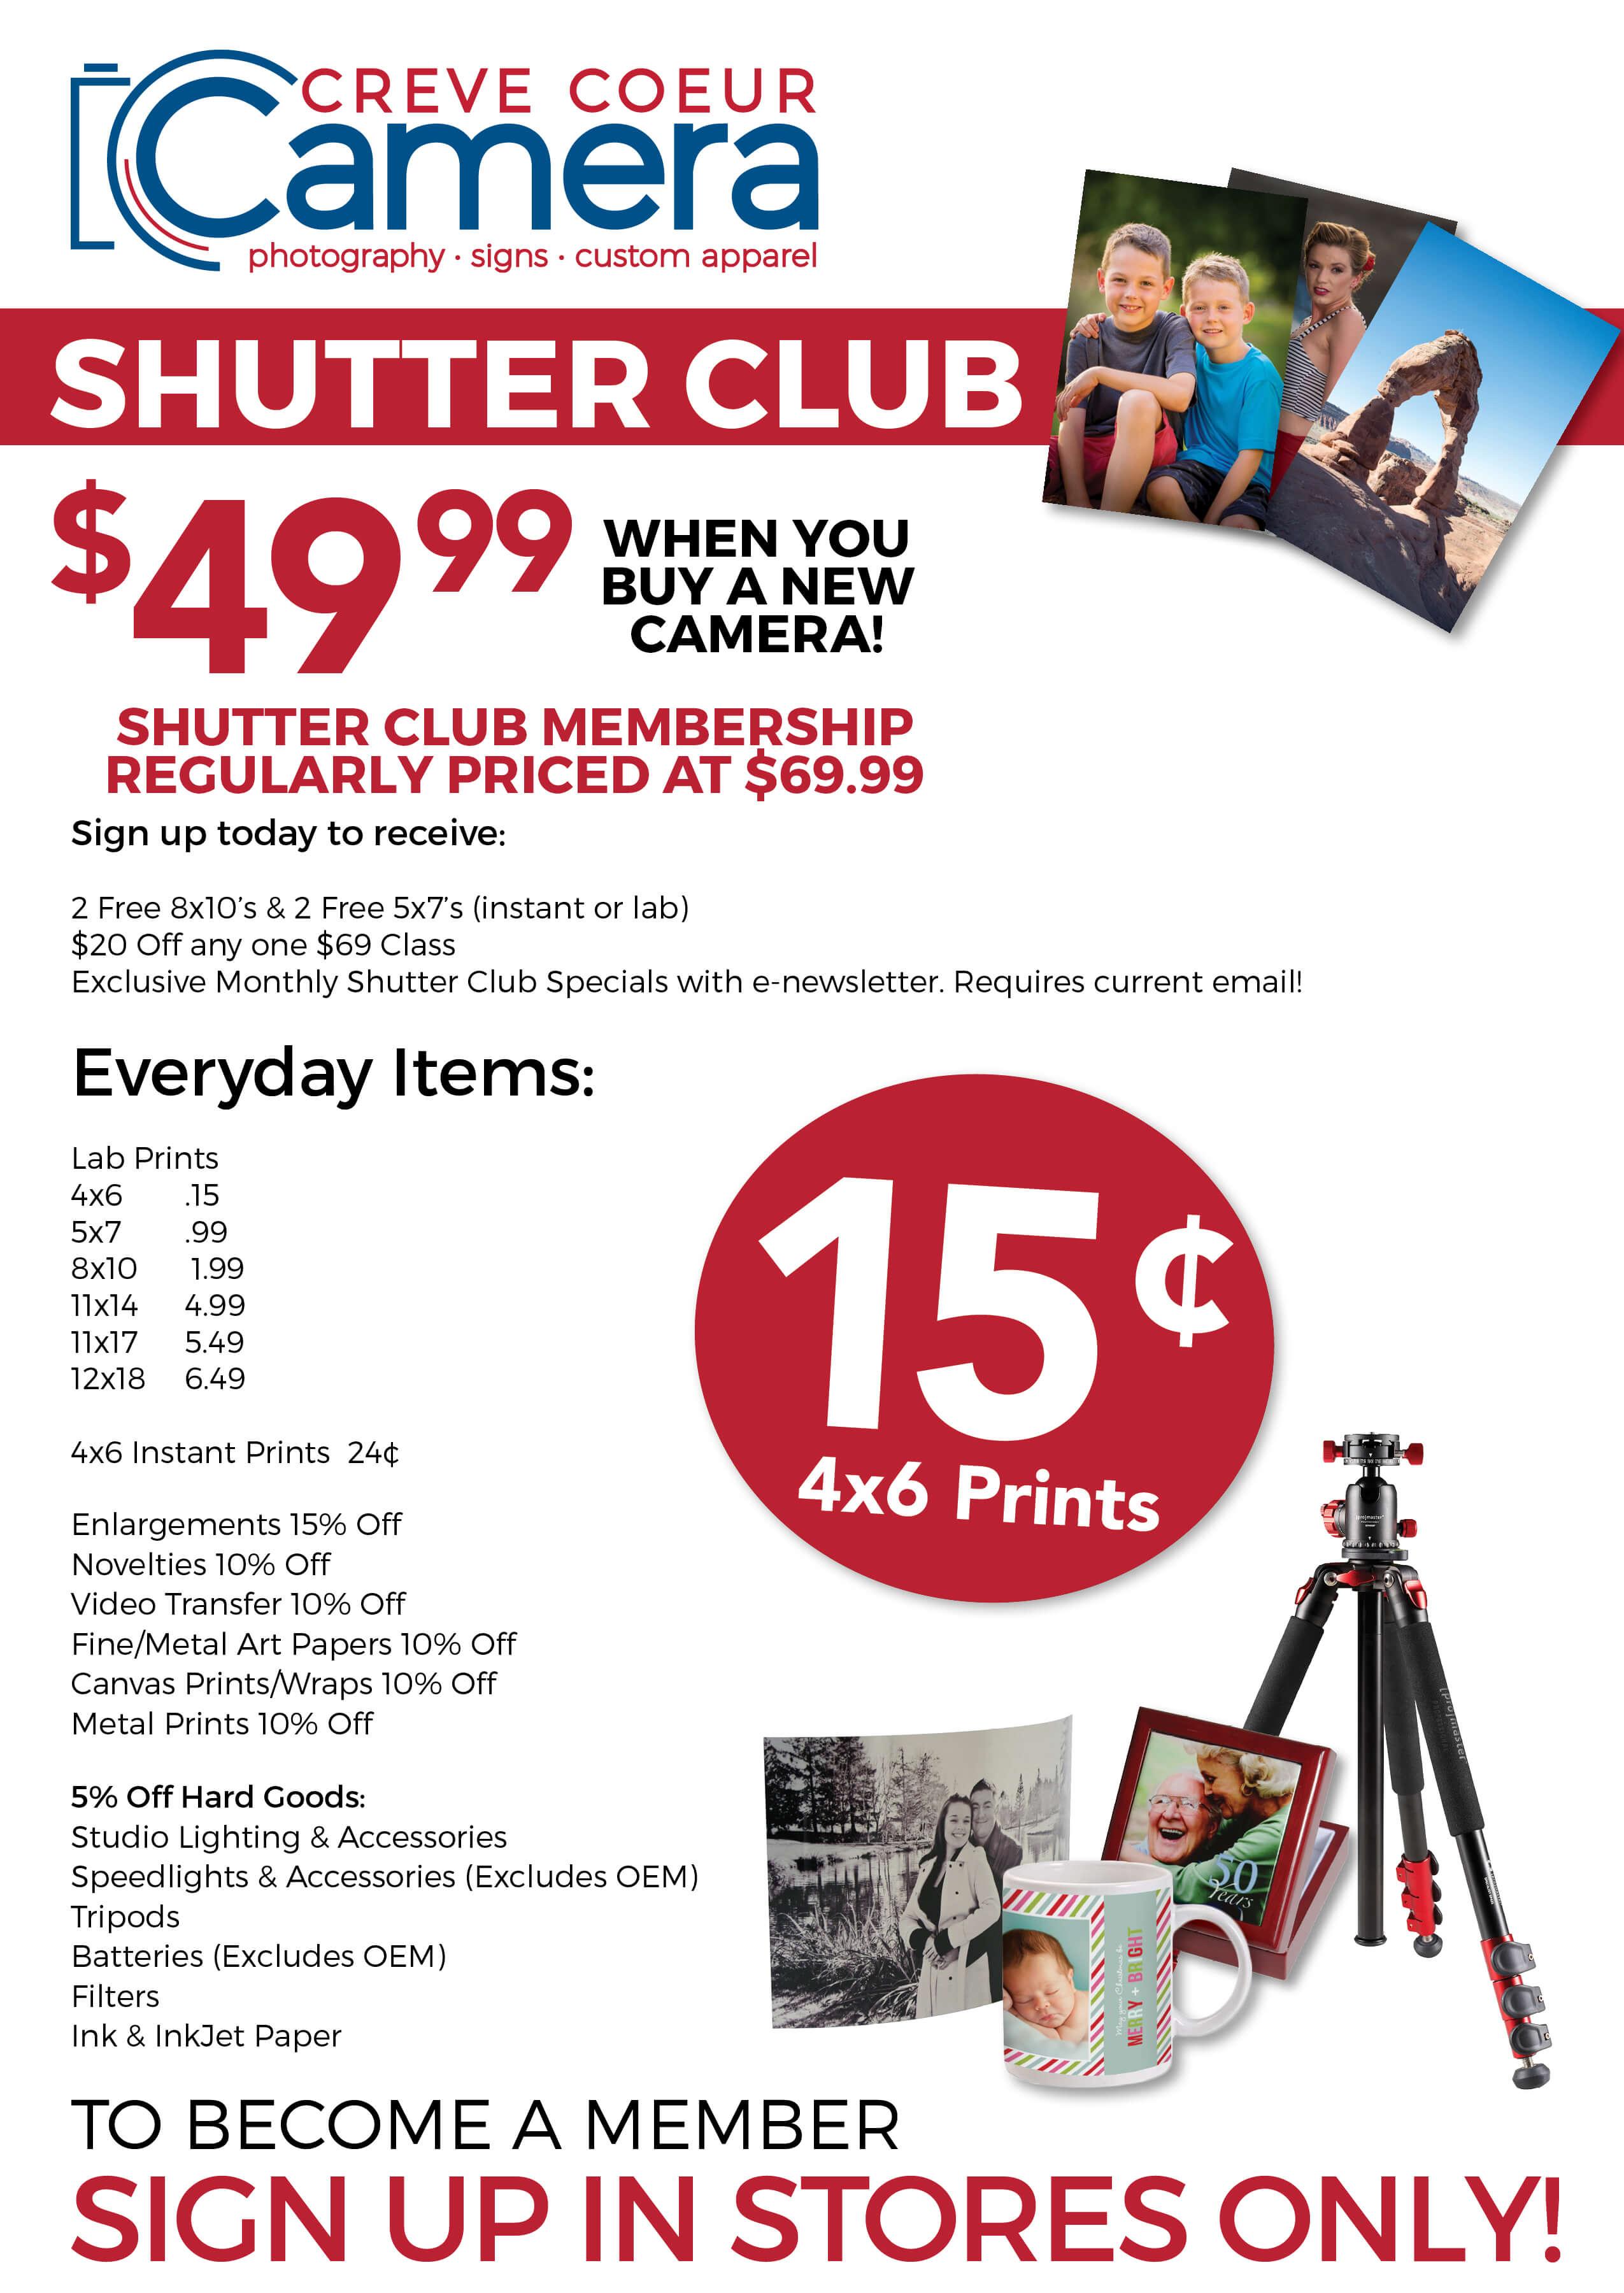 Shutter Club